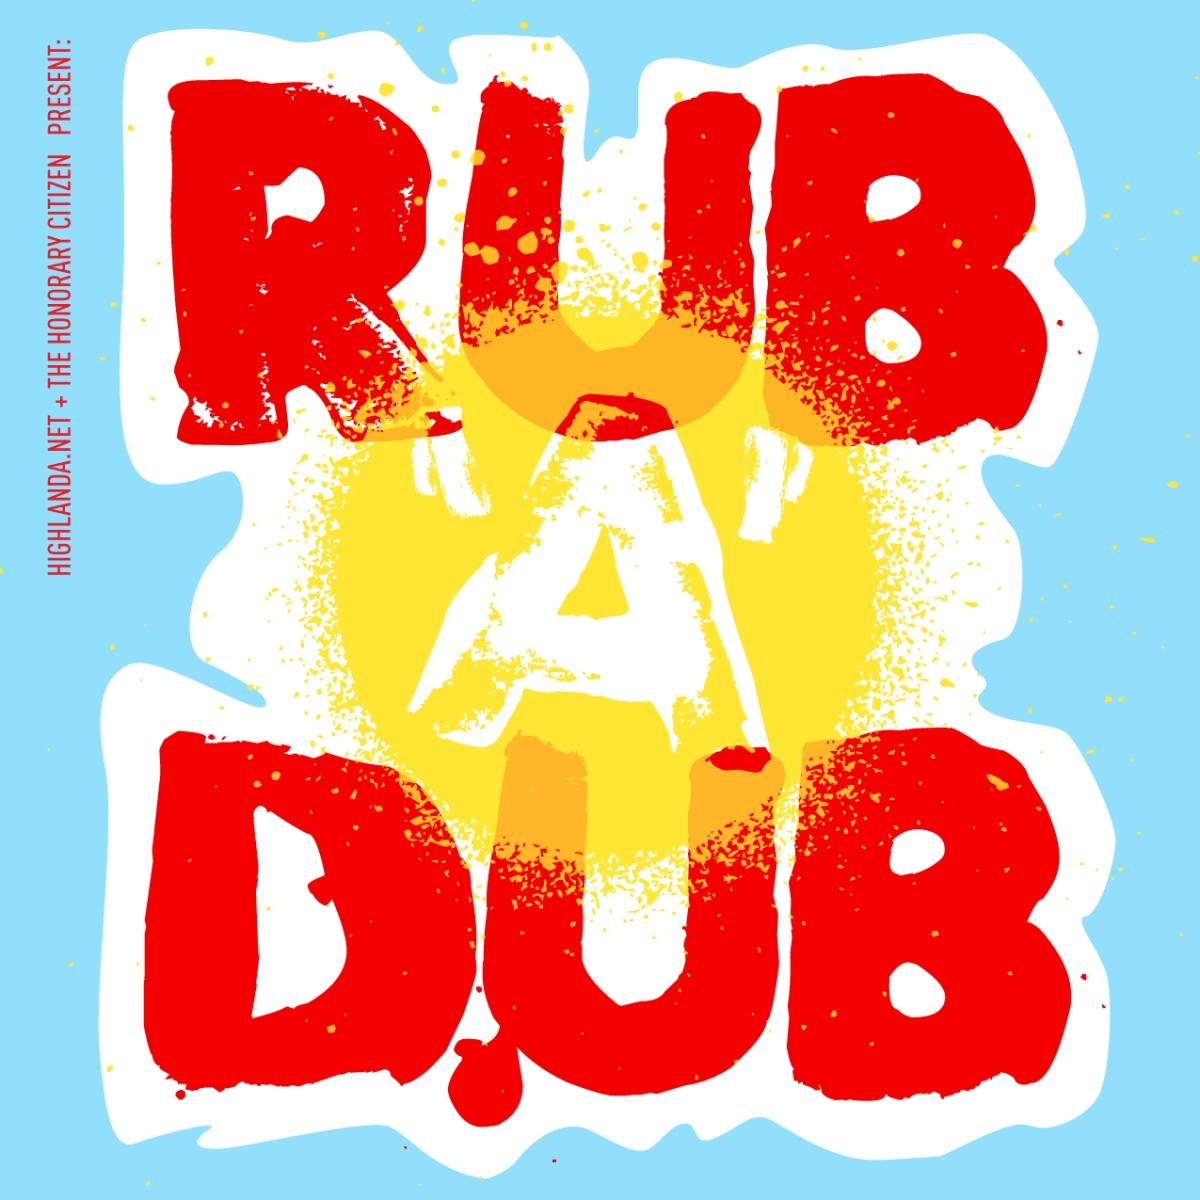 Rub A Dub (Second Sundays in ATL @ WildPitch Music Hall)